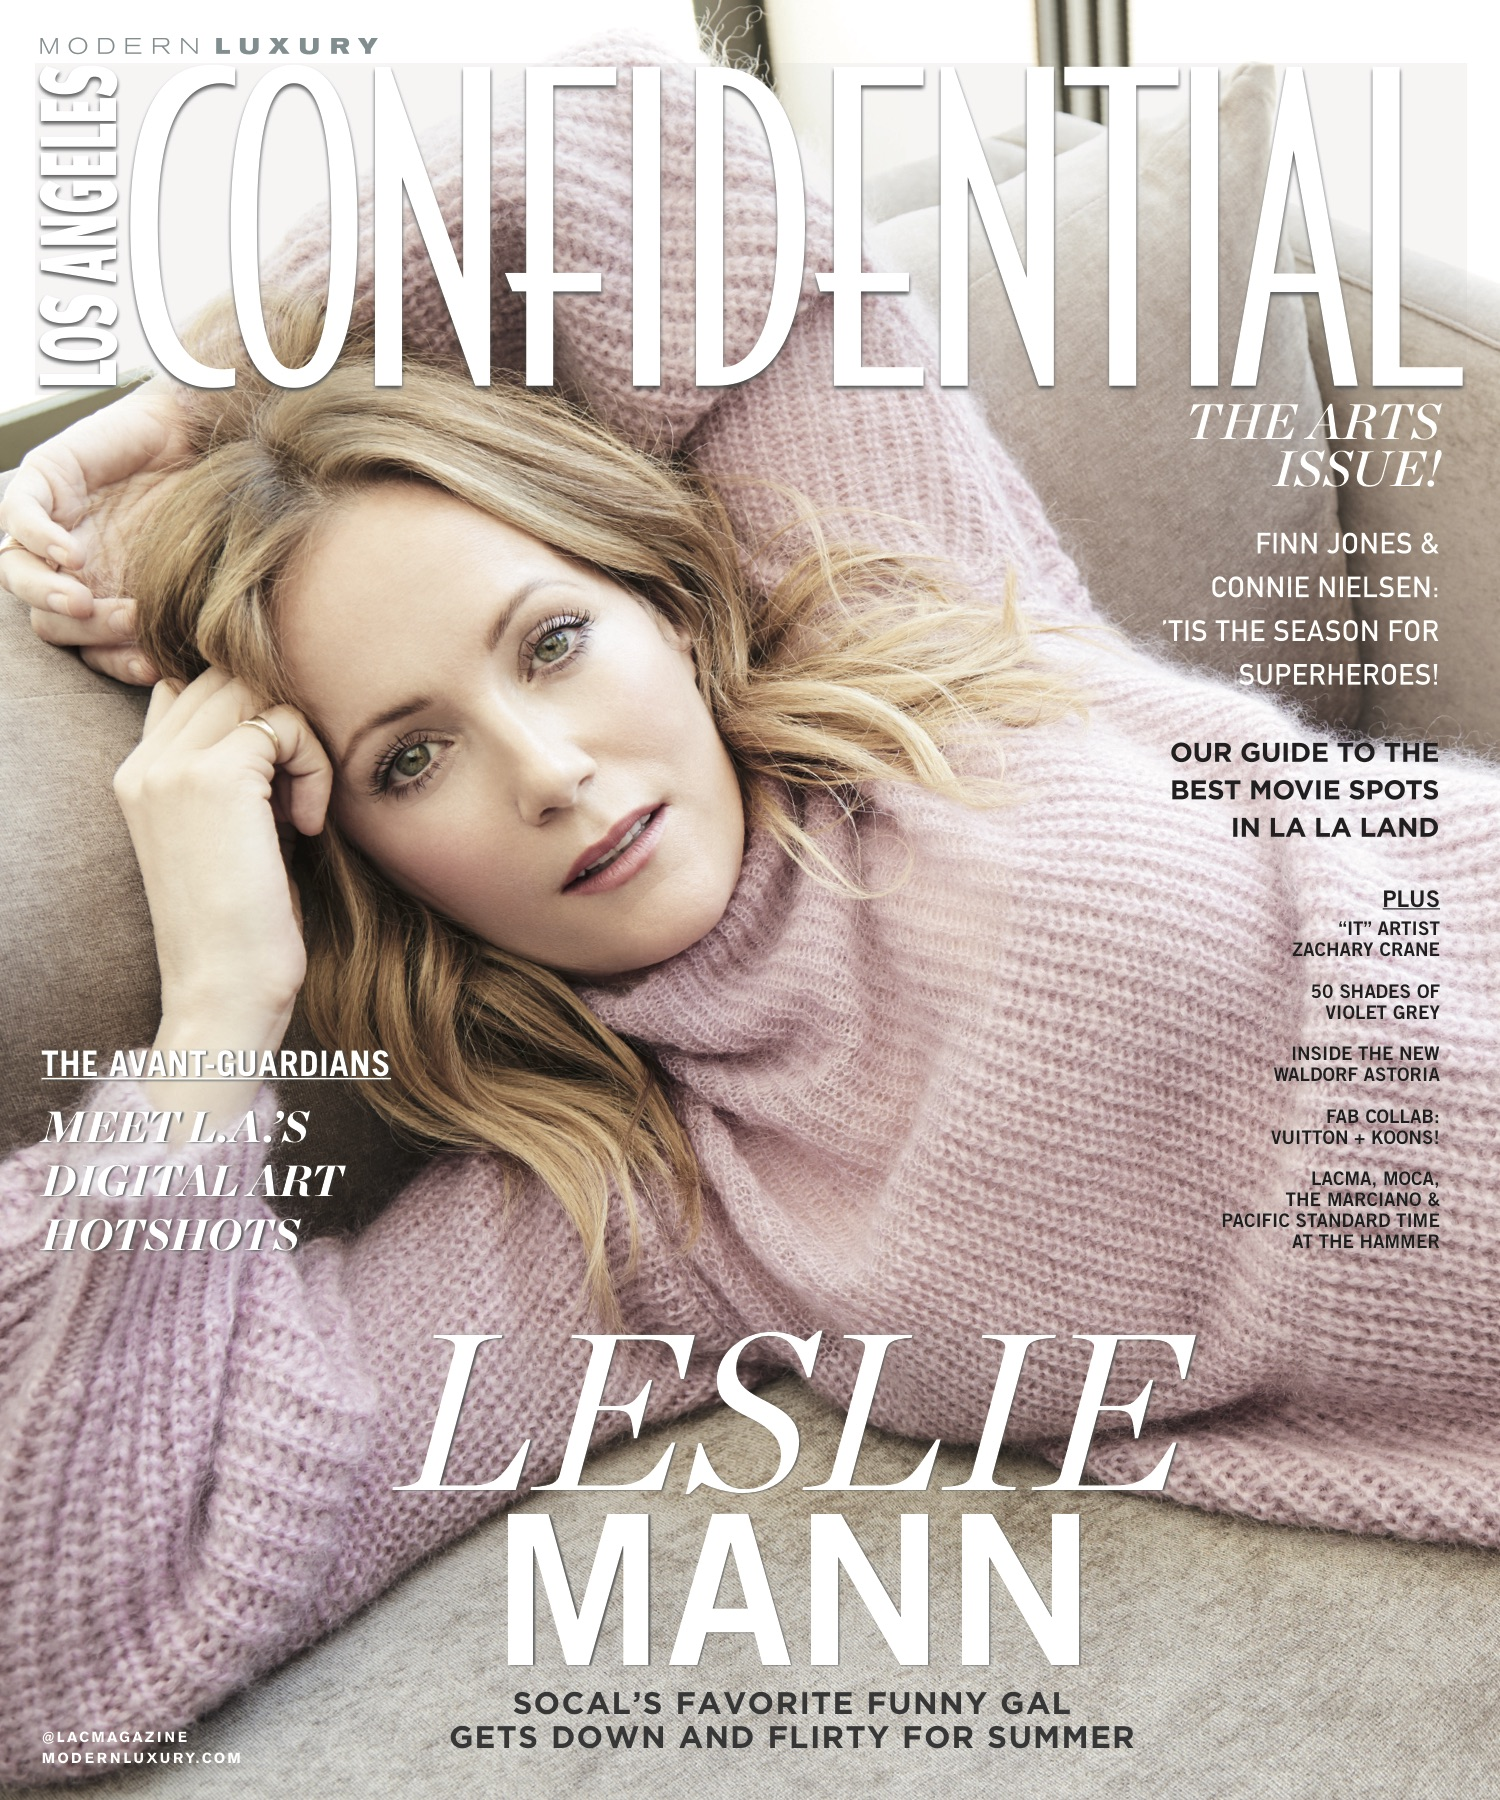 leslie_mann_anr_signature_collection